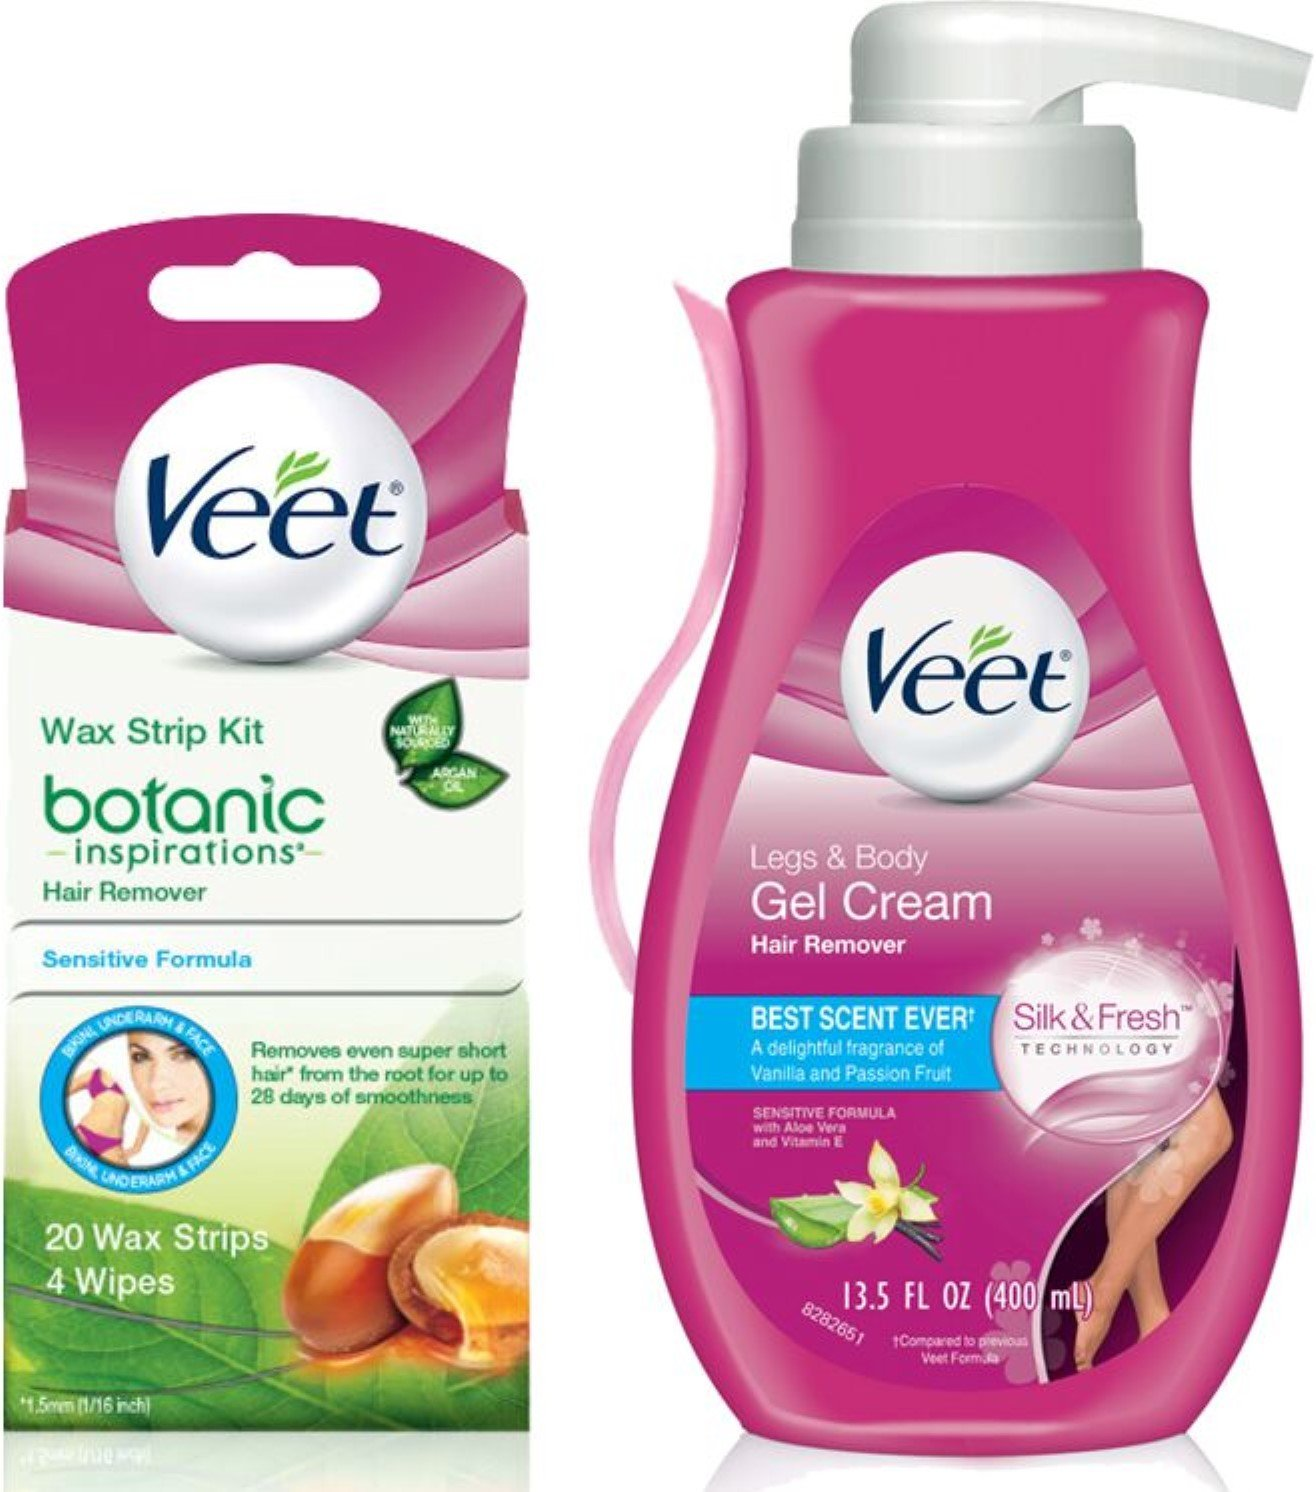 Veet (Gel + Wax Strips Kit) Gel Hair Removal Cream, Legs & Body 13.52 oz & Botanic Inspirations Wax Strip Kit Bikini, Underarm, Face 20 Ct, 1 ea Reckitt Benckiser